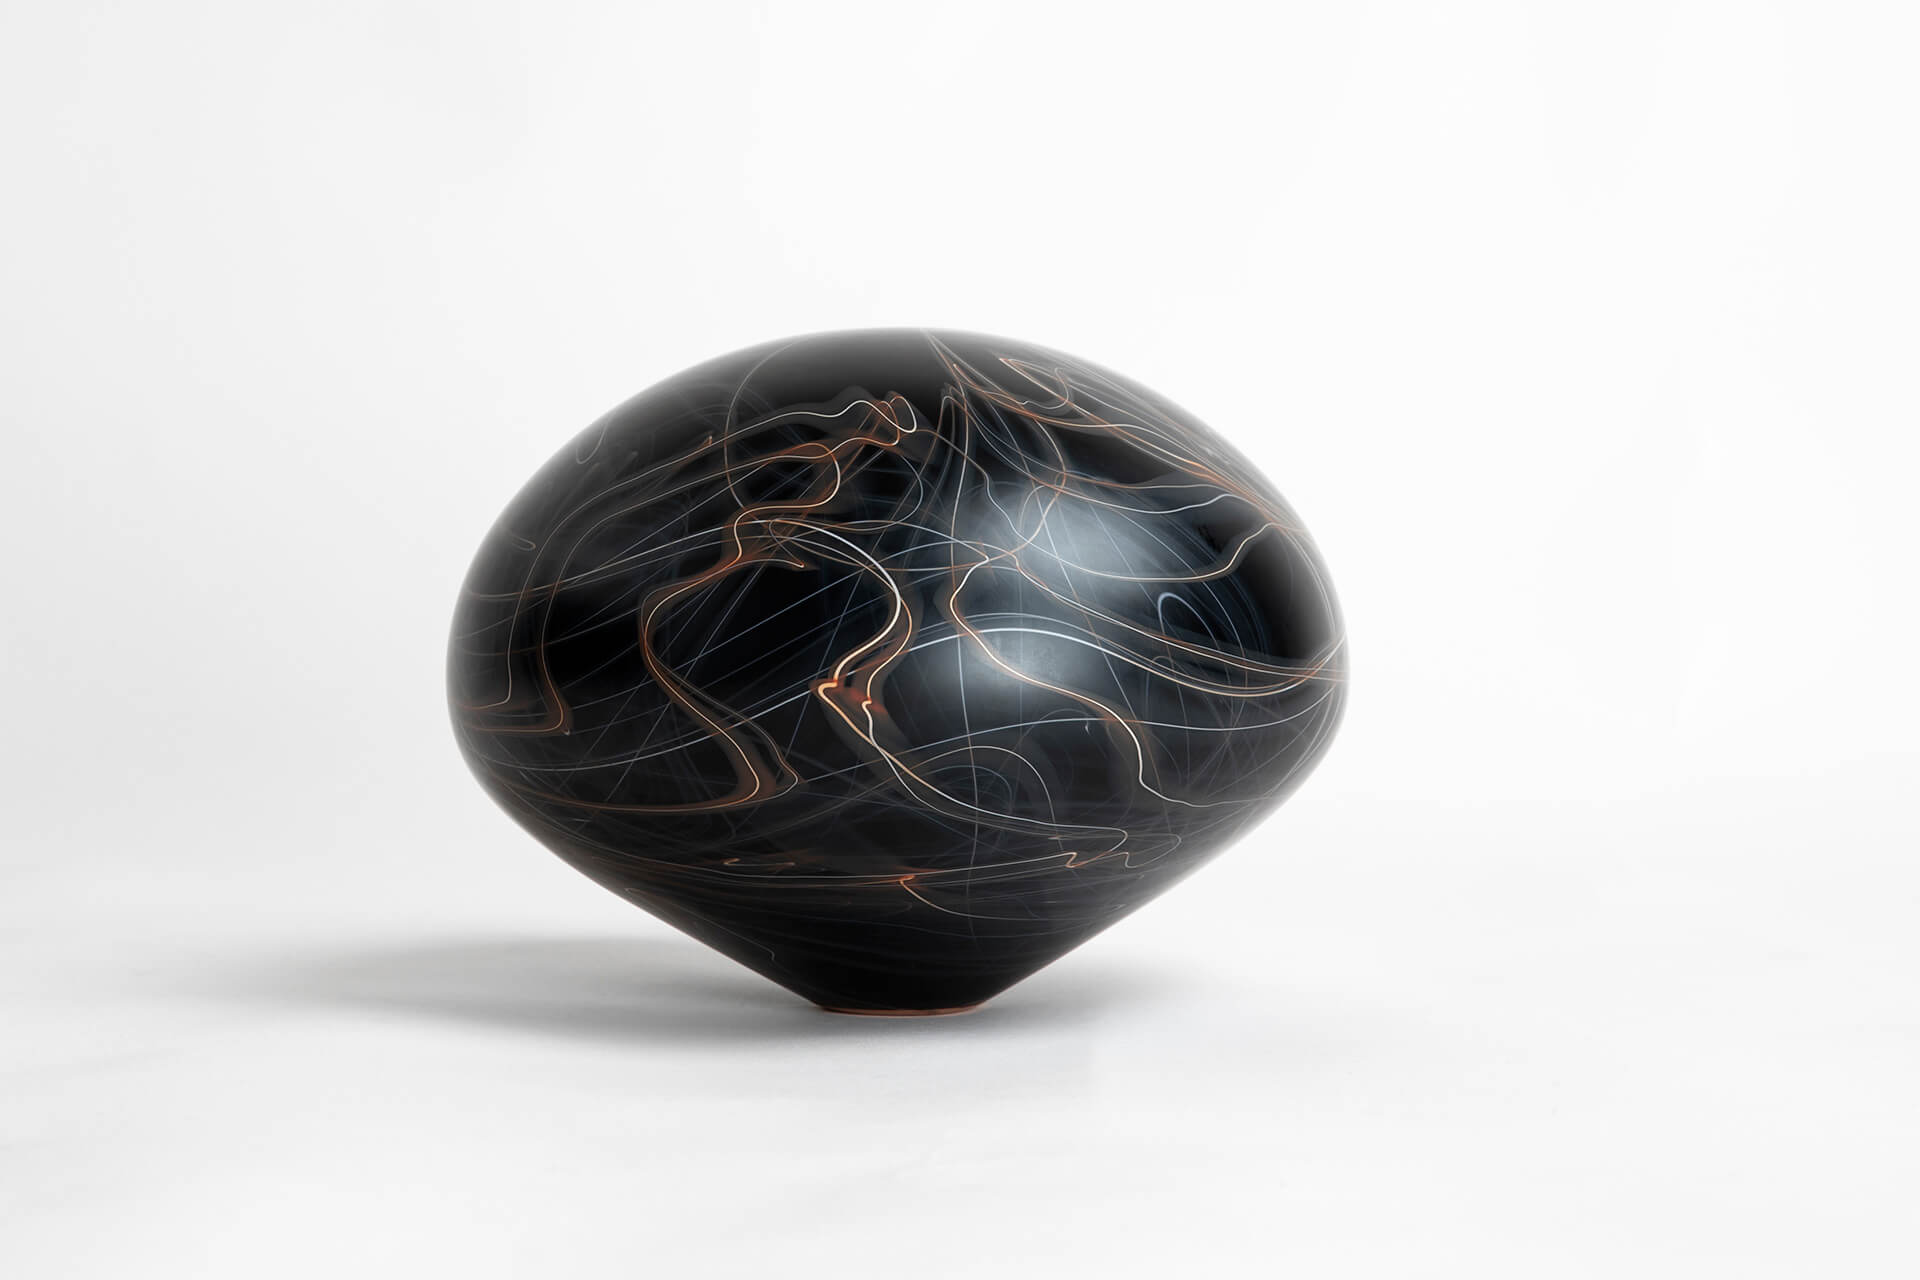 Jonas Noël Niedermann, Floating Lines, Nov Gallery, Carouge, Genevé, Craft, Glassart, Switzerland, Glass Artist